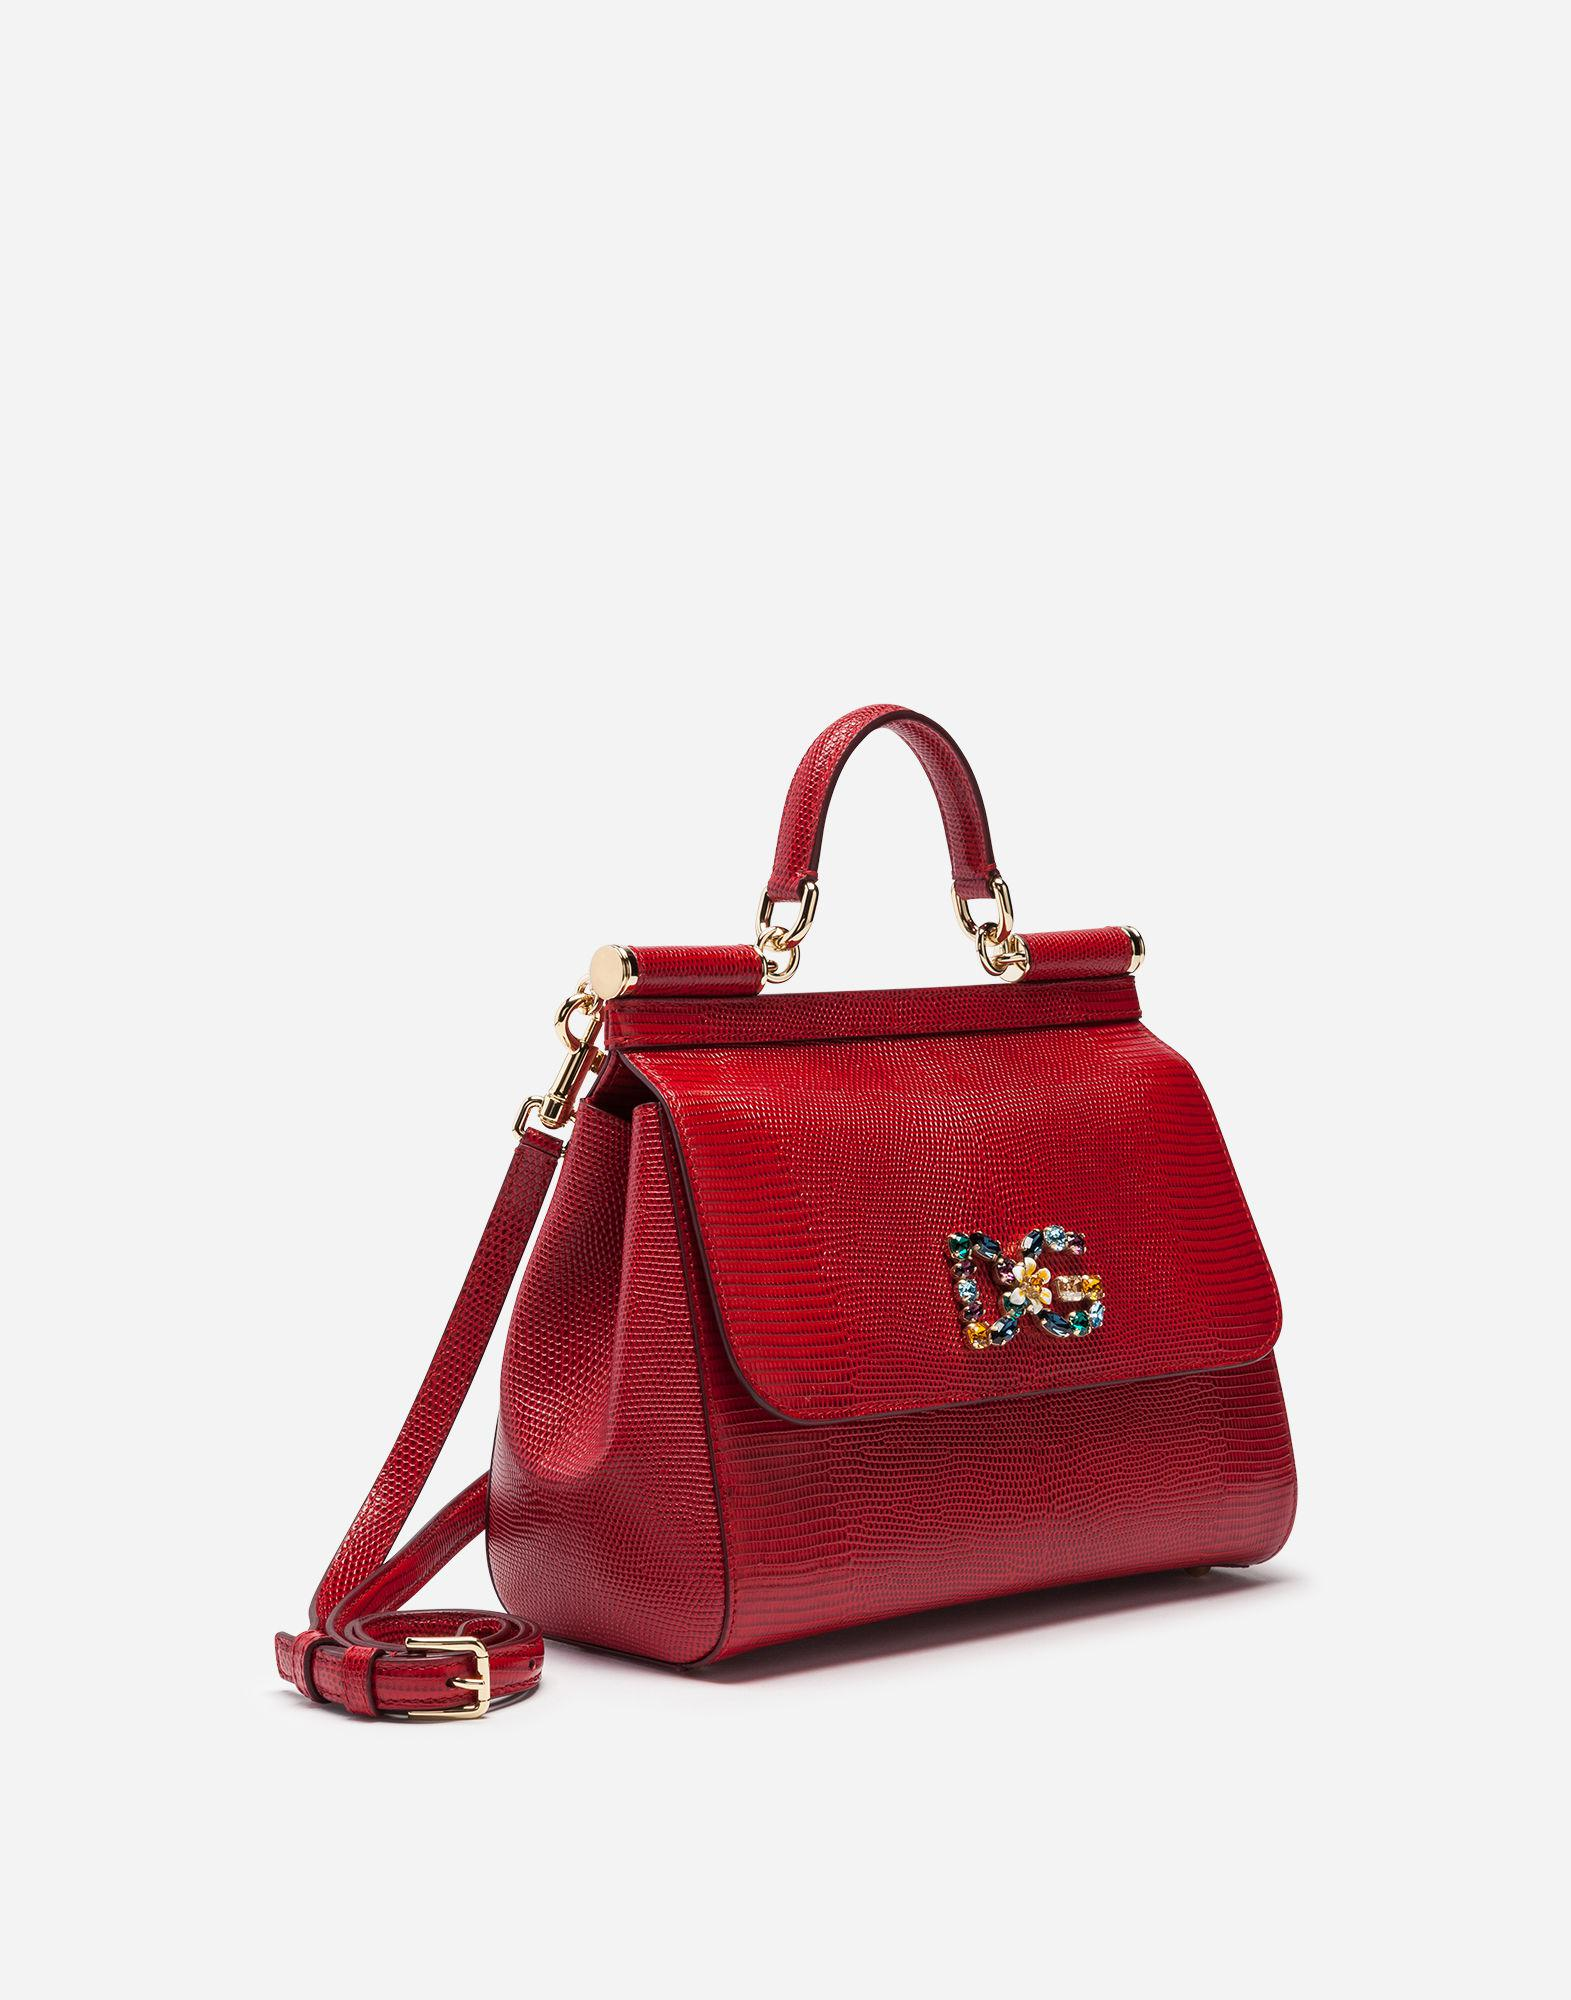 Lyst - Dolce   Gabbana Medium Sicily Bag In Iguana Print Calfskin With Dg  Logo Crystalsâ in Red 6bdde9f133